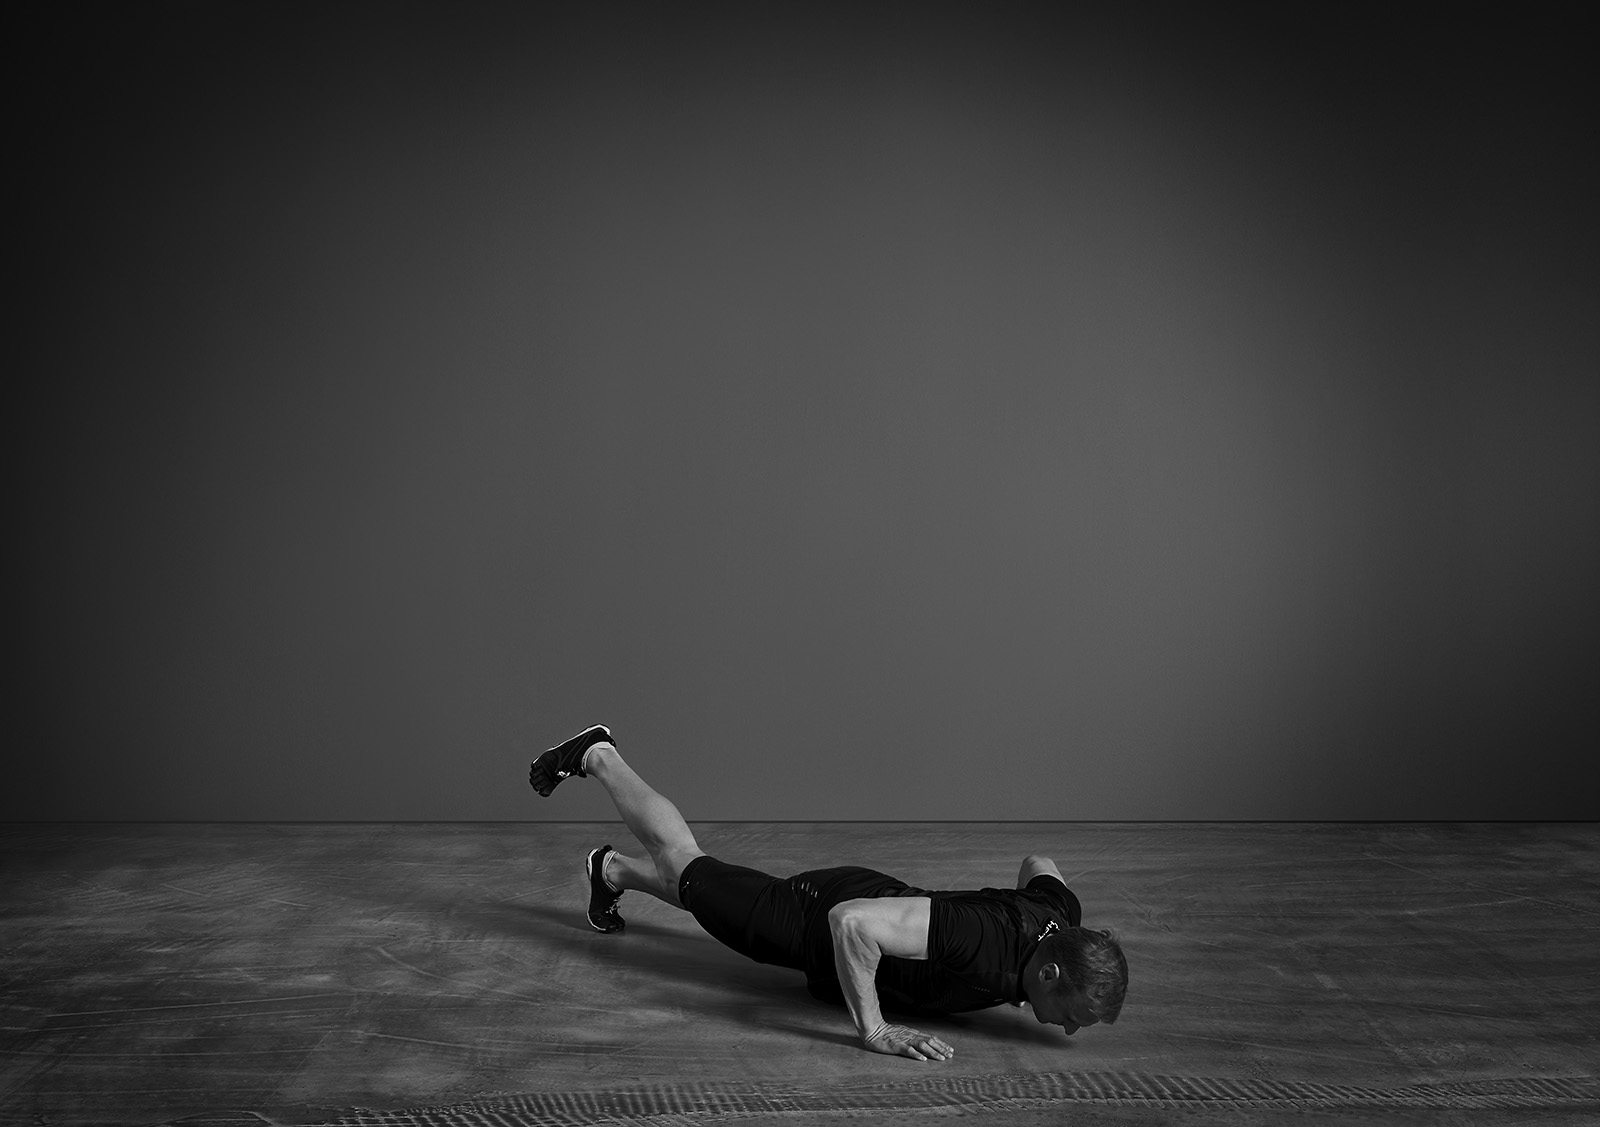 patrick_schreiber_Personal-Training-burpees_one_leg